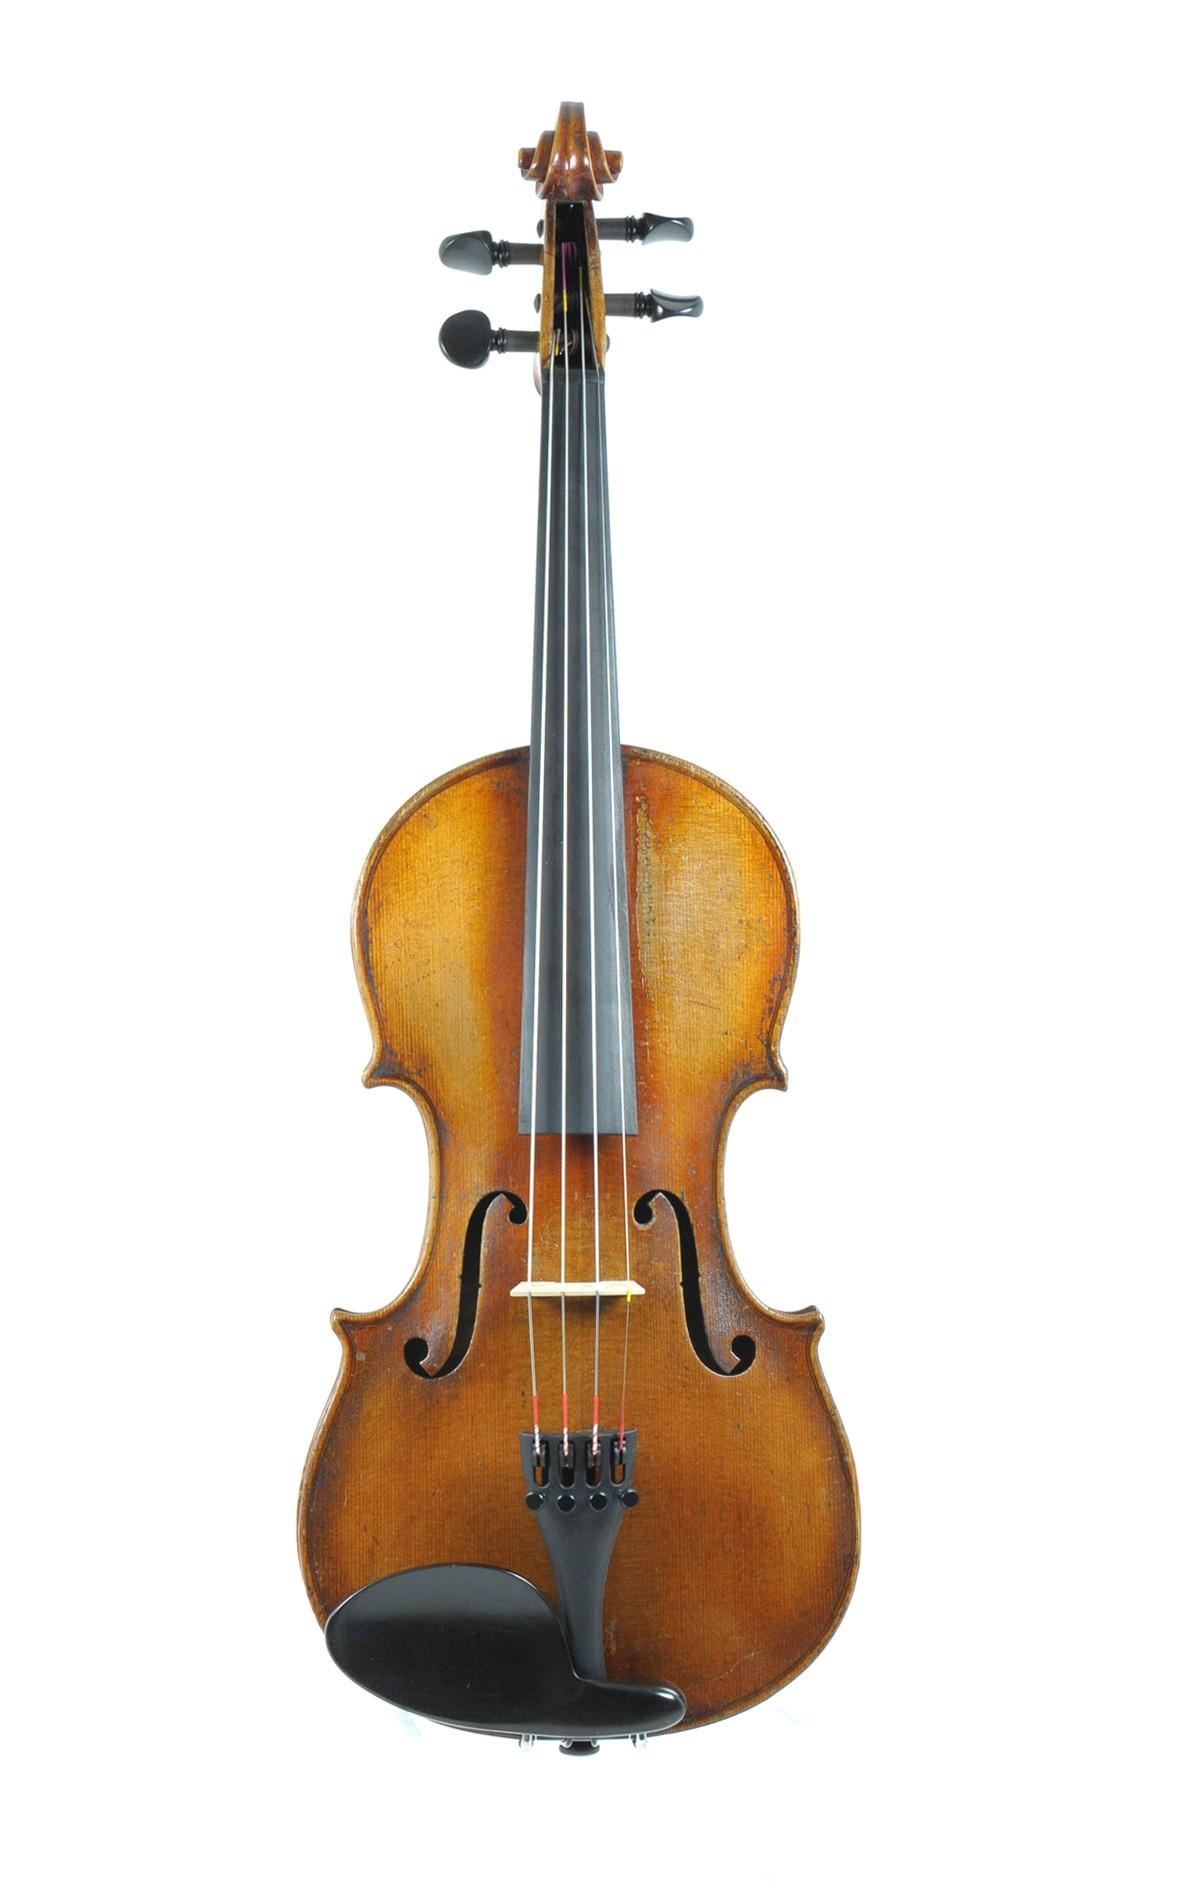 3/4 German violin approx. 1880 - top